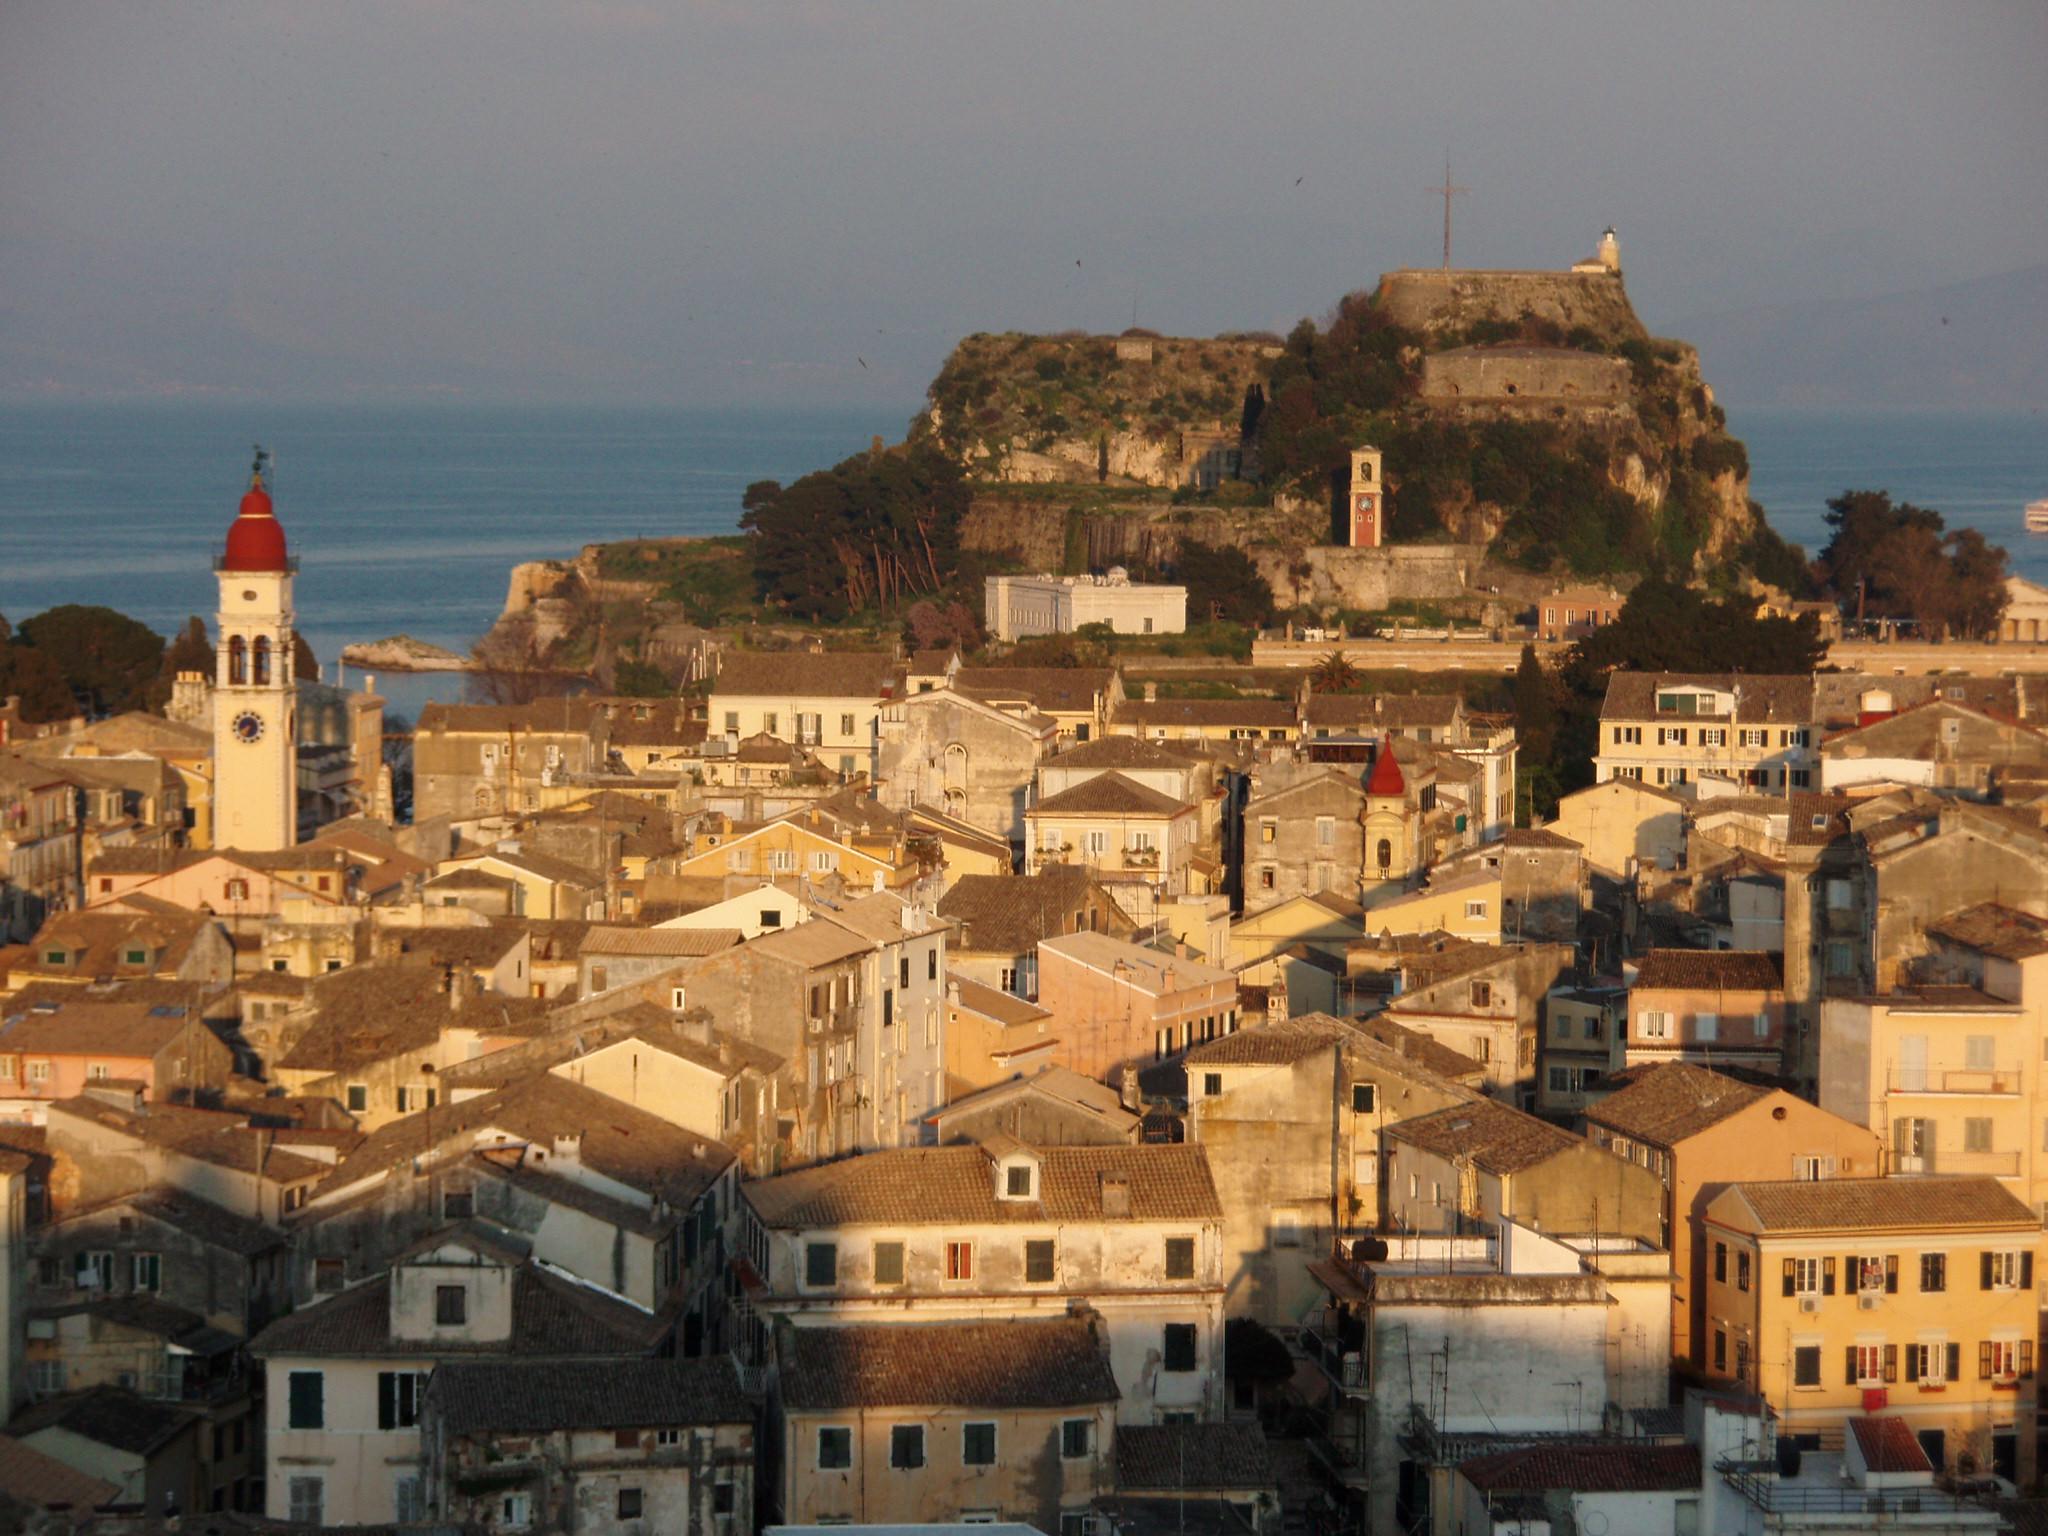 File:Corfu old town & Old Fortress.jpg